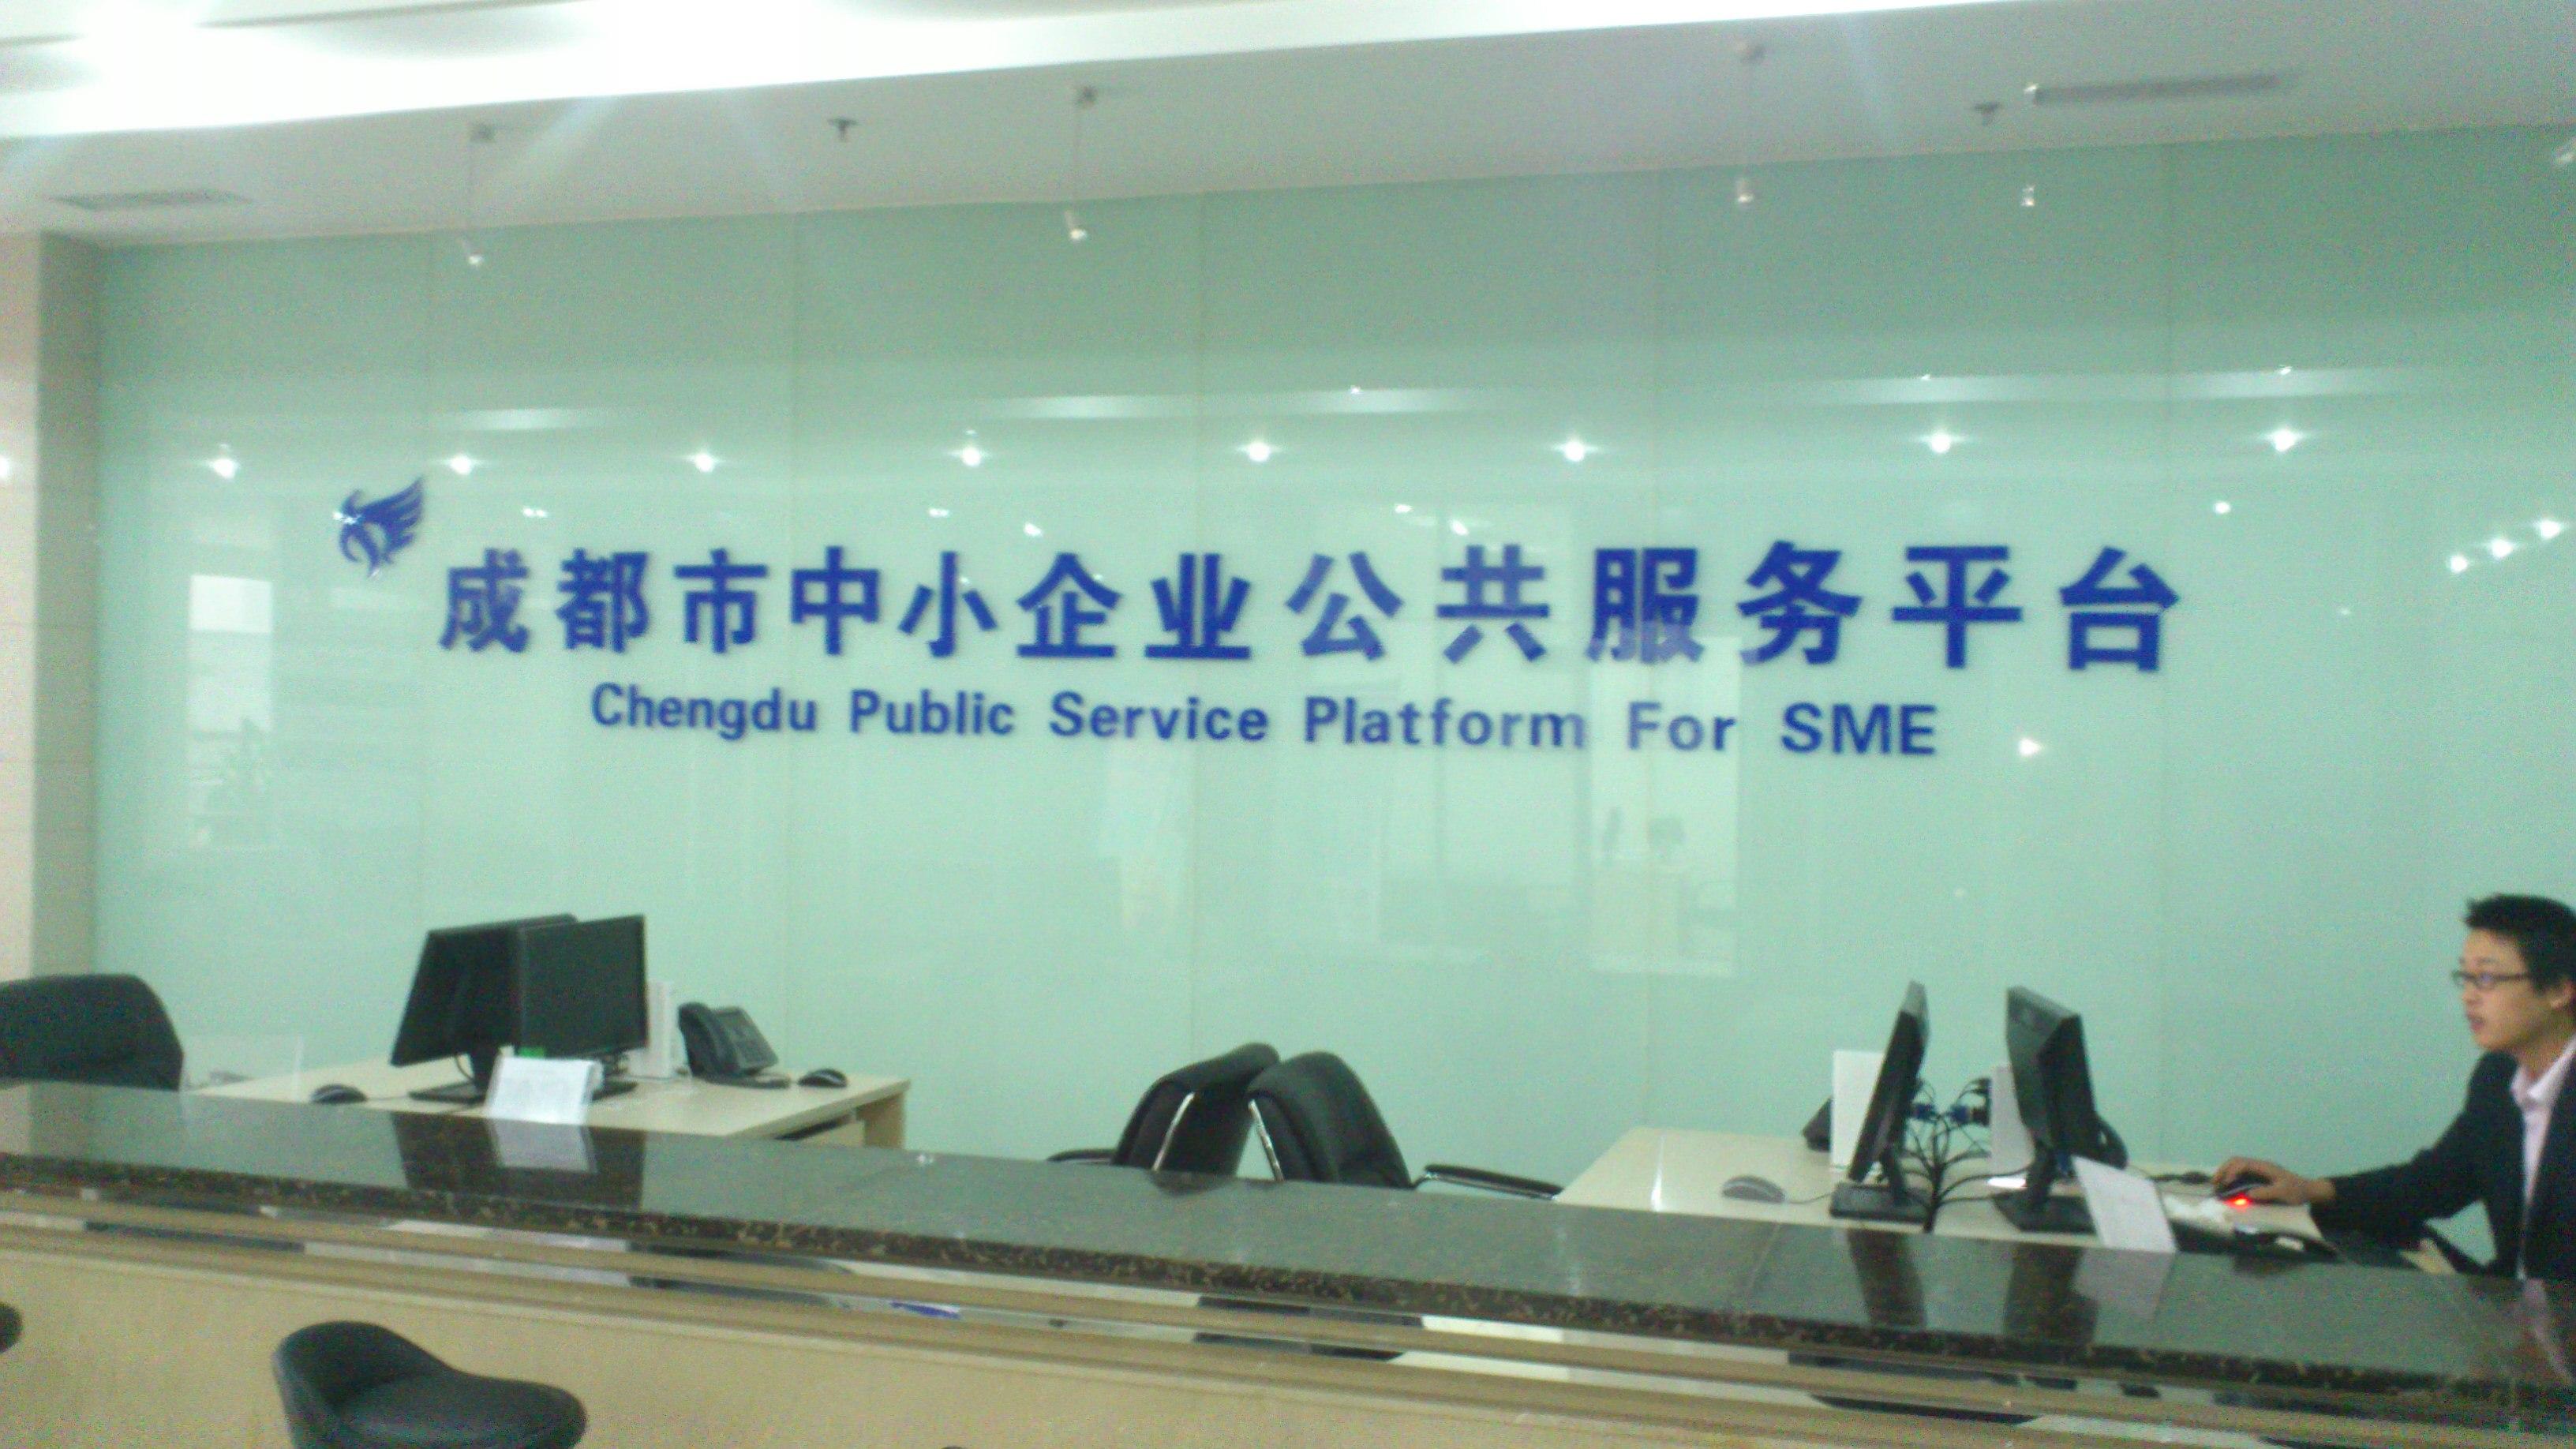 中小企业服务平台_中小企业服务平台网